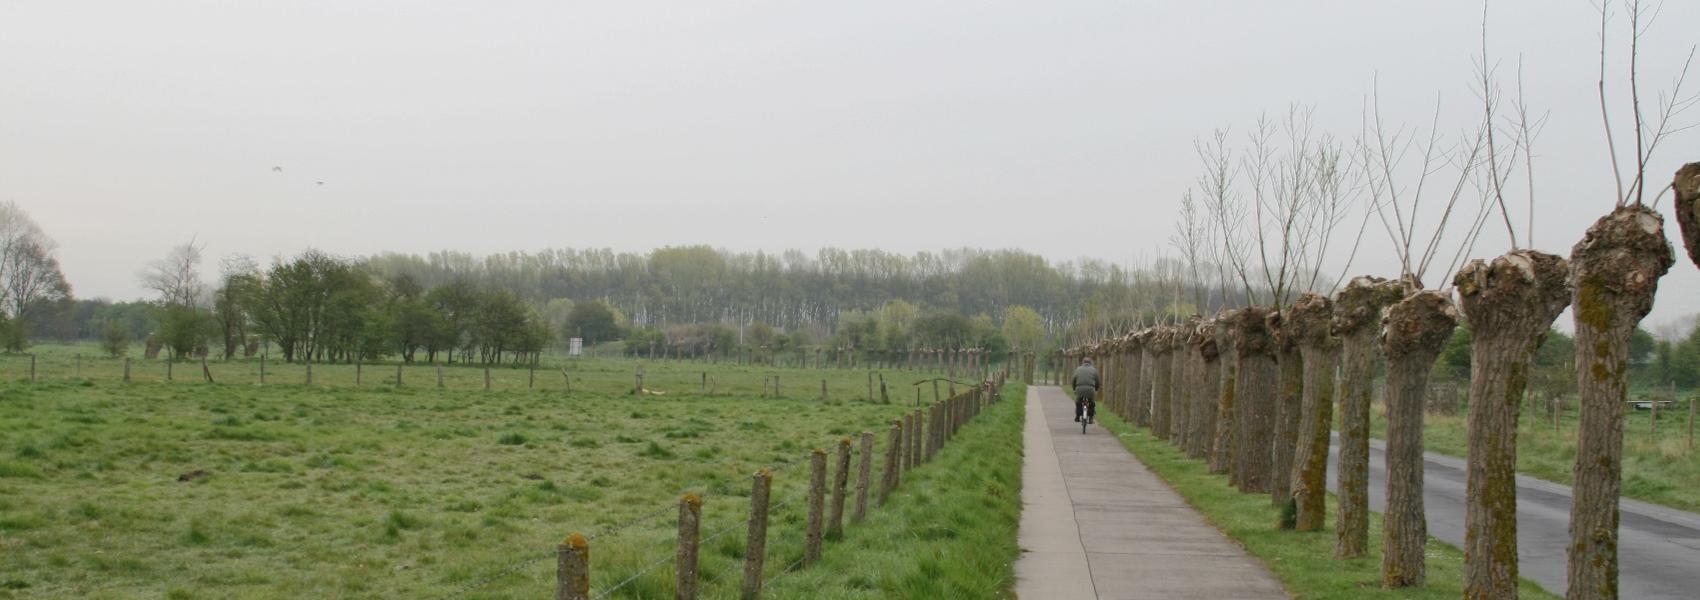 fietser op fietspad langs wilgenrij